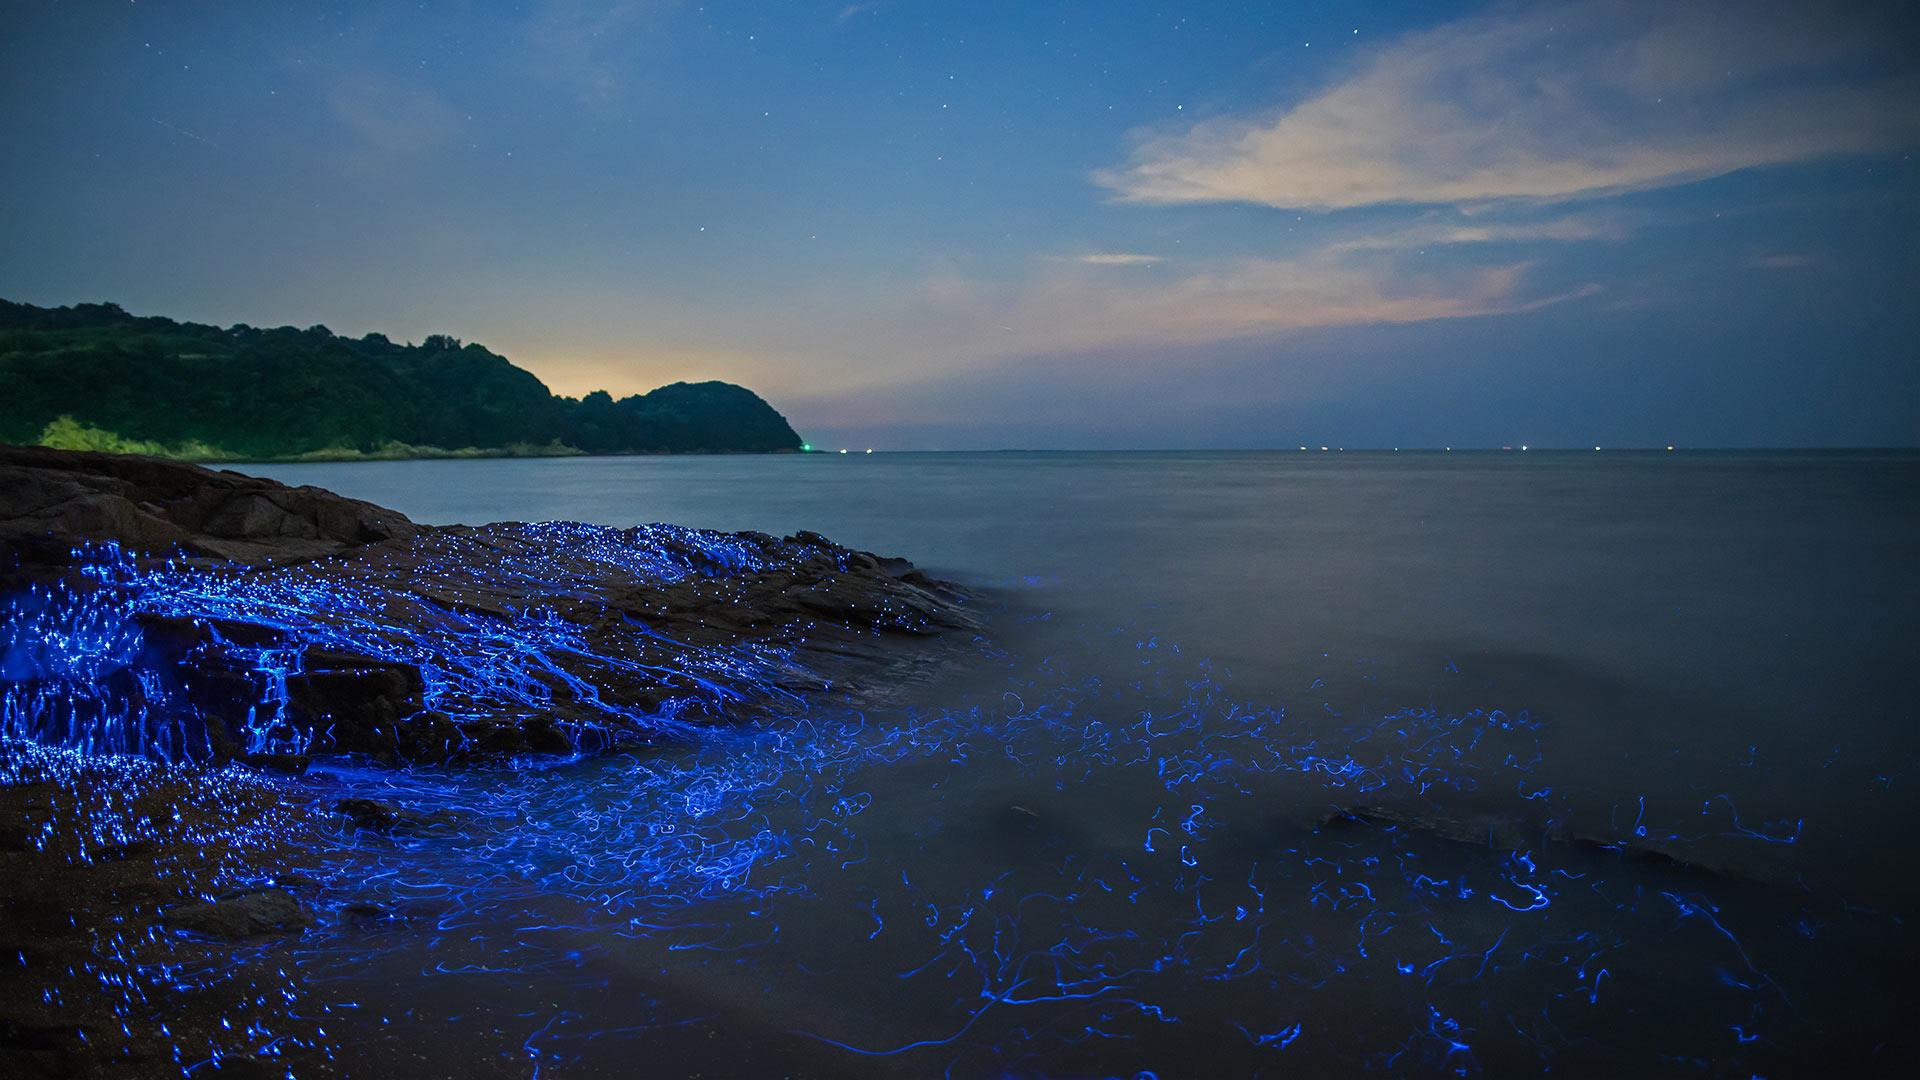 冈山沿岸的发光海洋萤火虫,日本 (© tdub_video/Getty Images) - Calf Blog